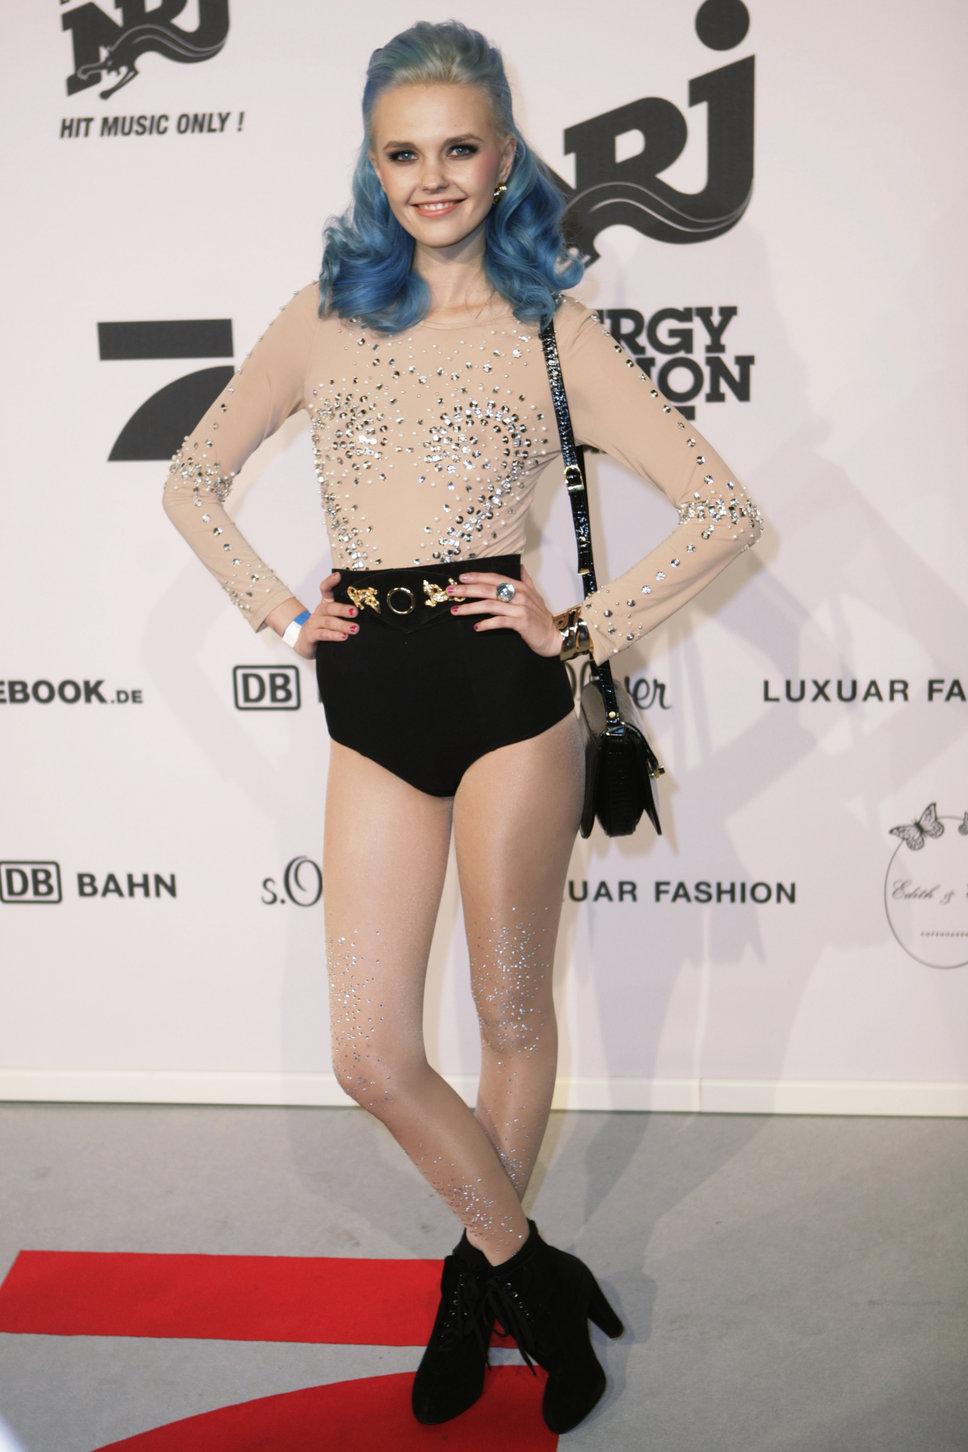 Photos Bonnie Strange nudes (55 photo), Ass, Hot, Twitter, in bikini 2018